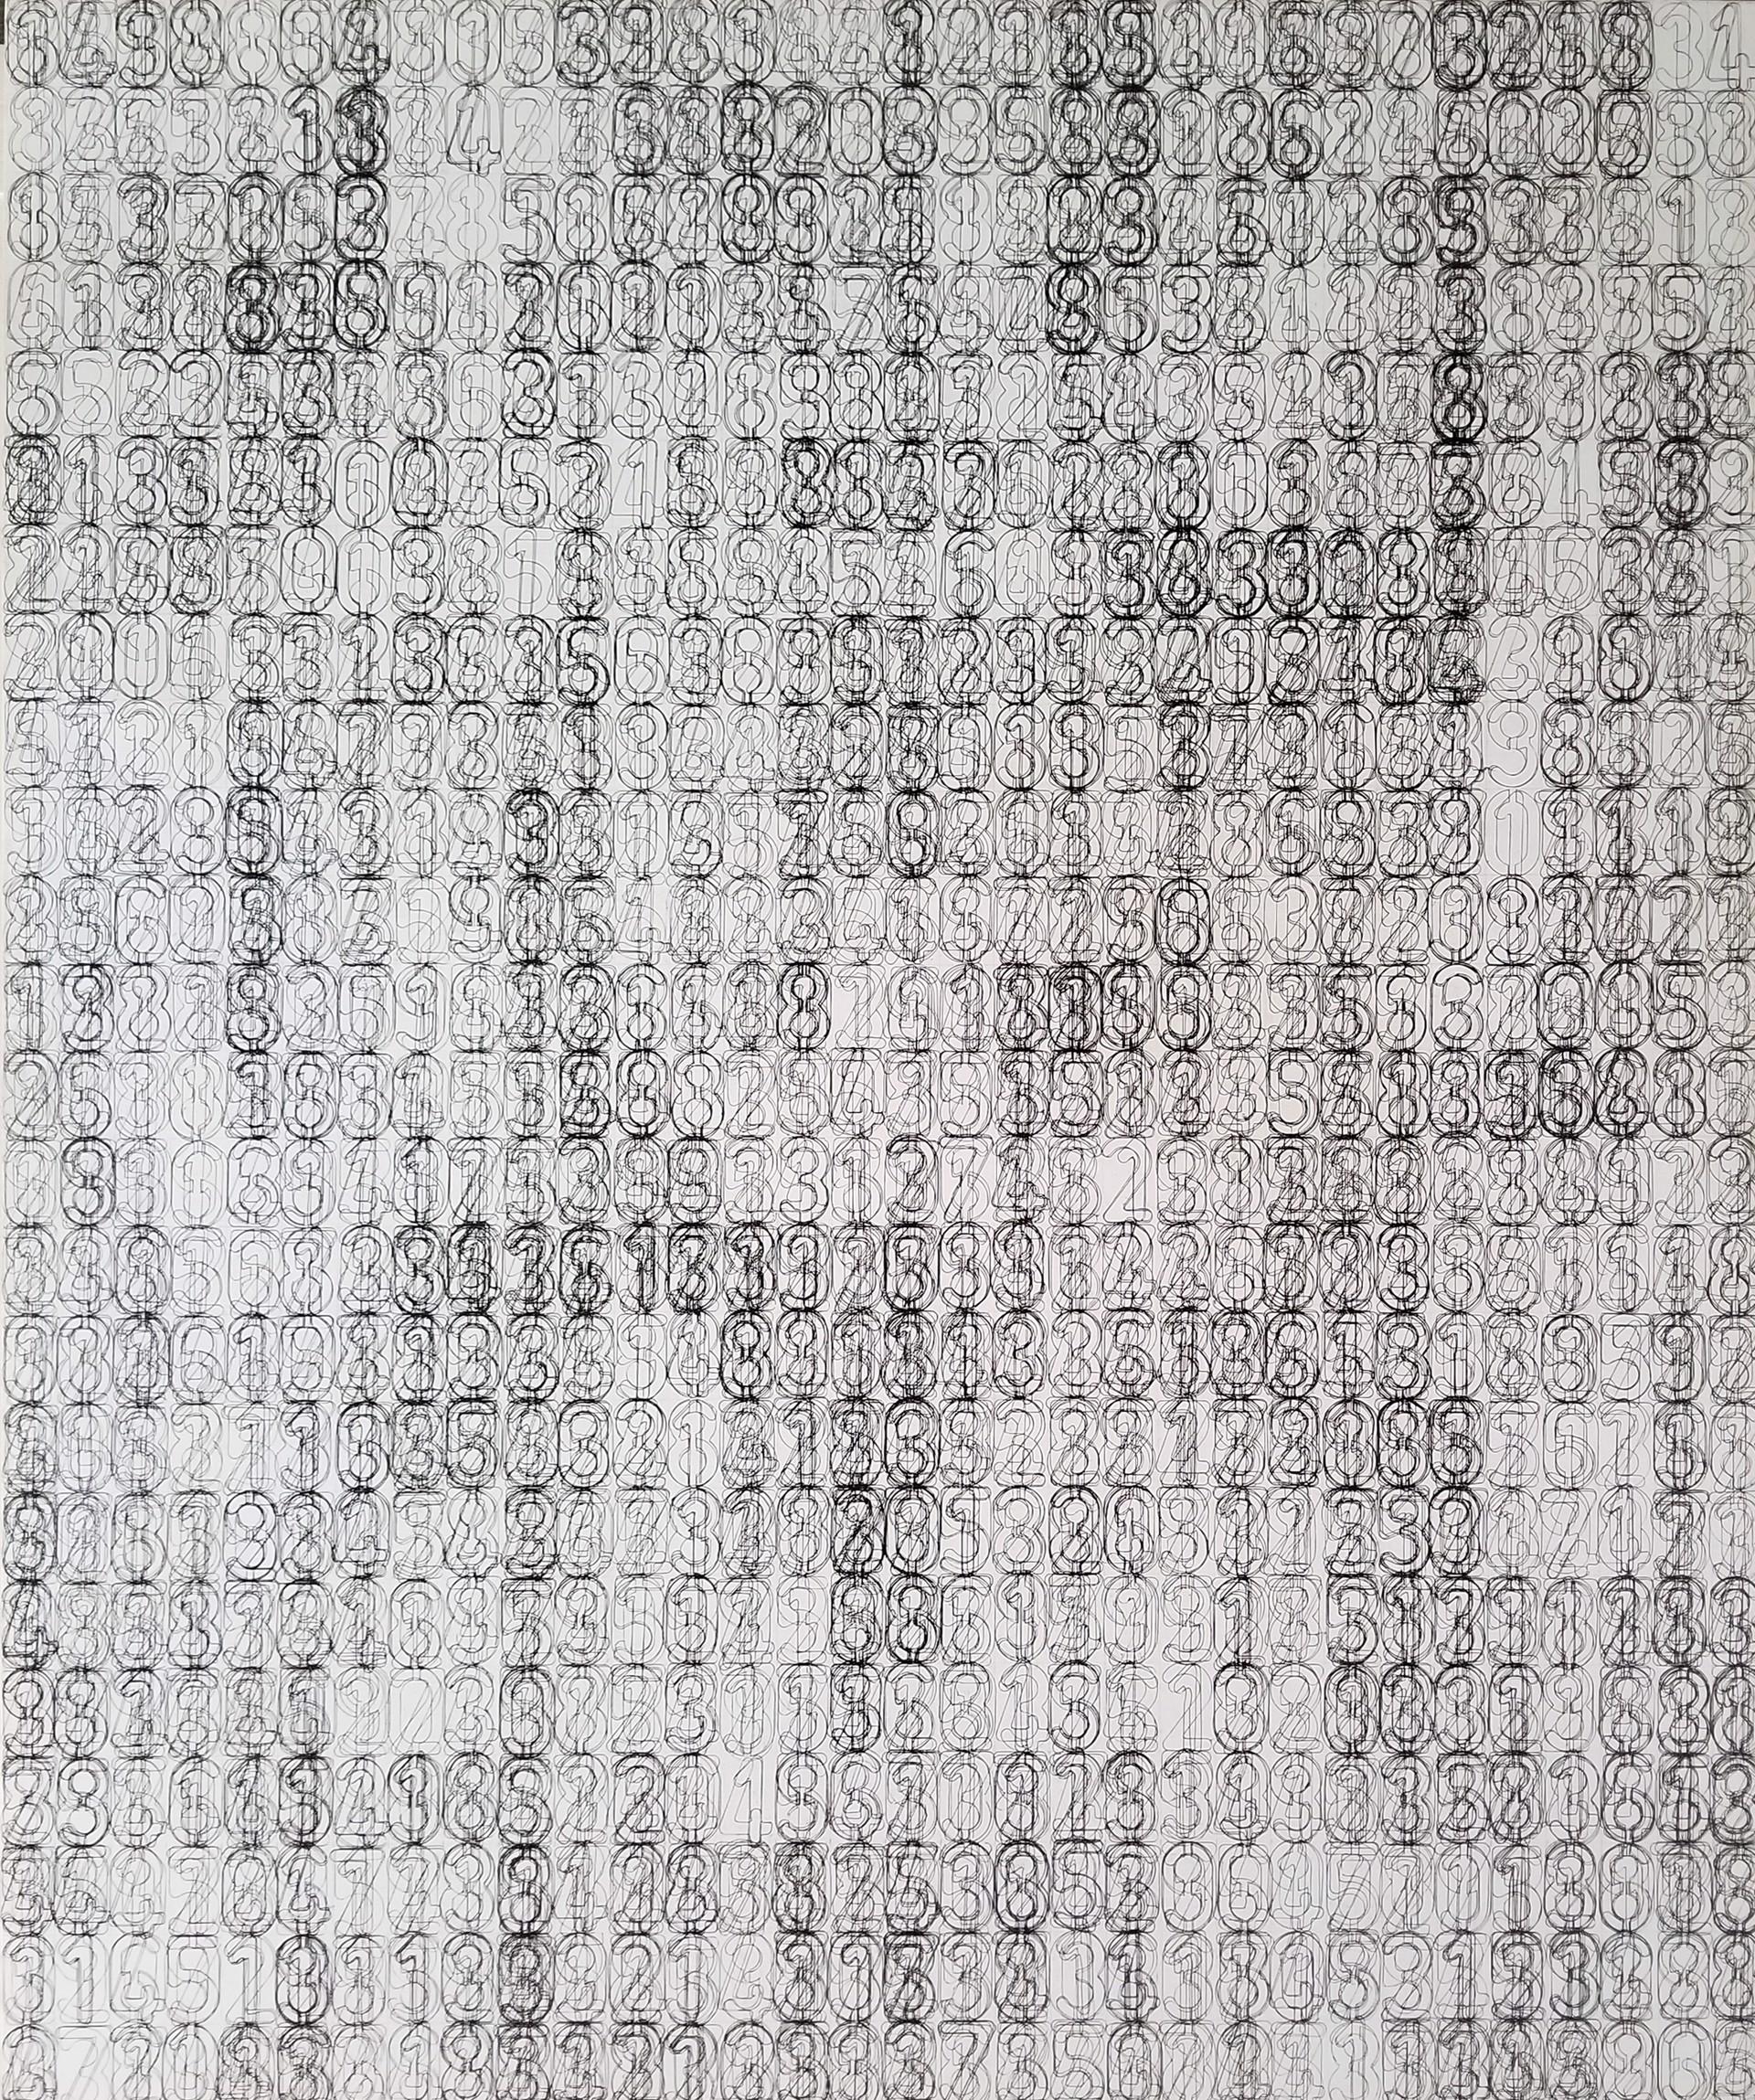 2,077 by John Adelman